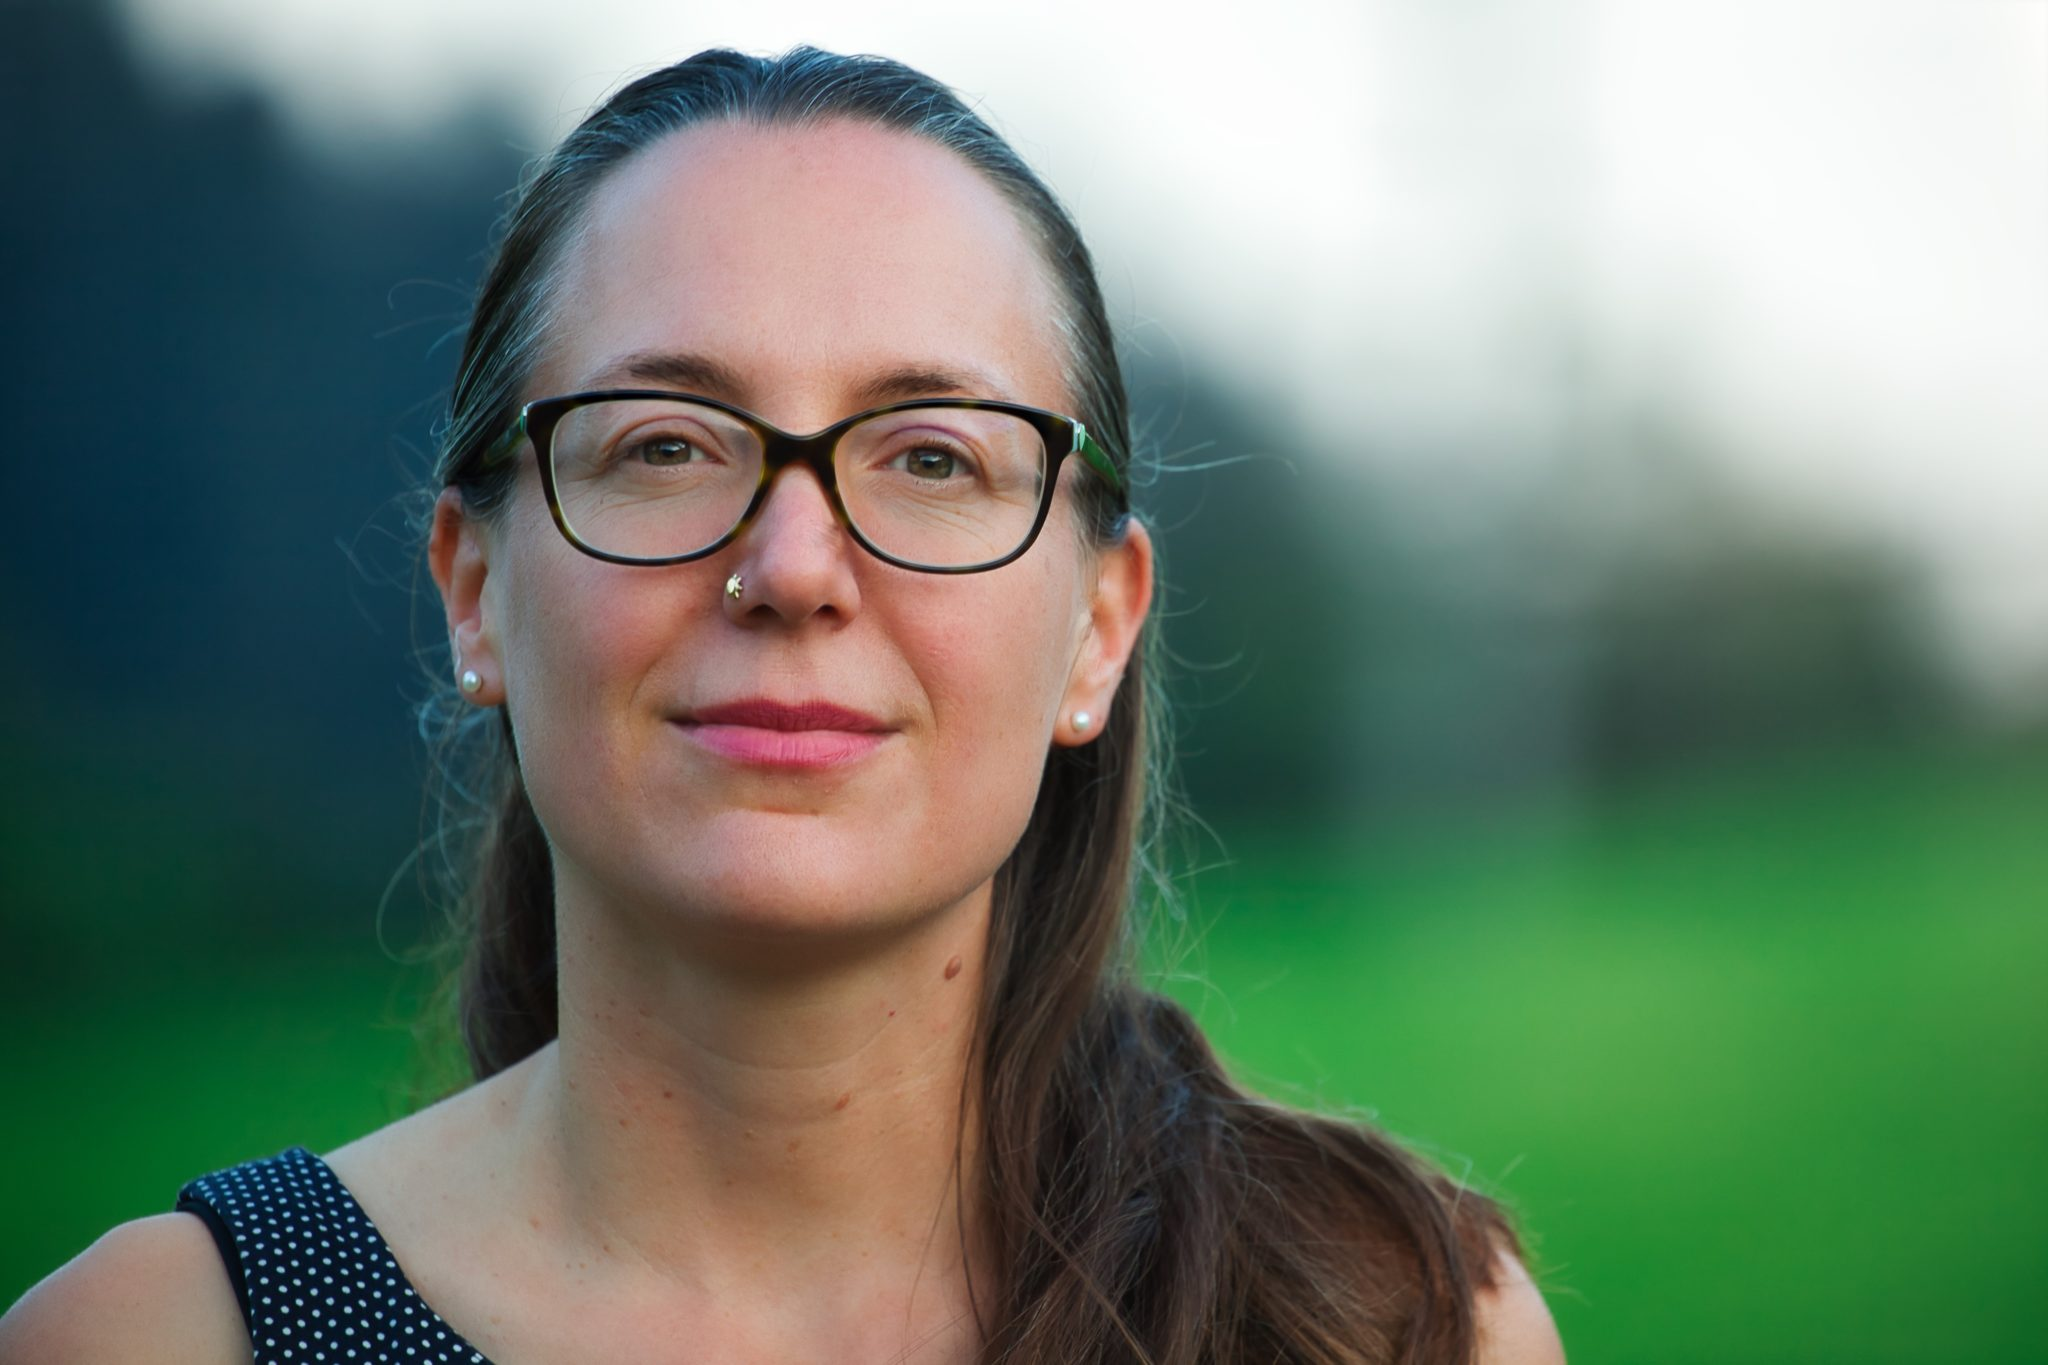 https://urbanes-lernen.obnf.de/wp-content/uploads/2020/11/Sarah-Moll_WS-12-GMK-scaled.jpeg